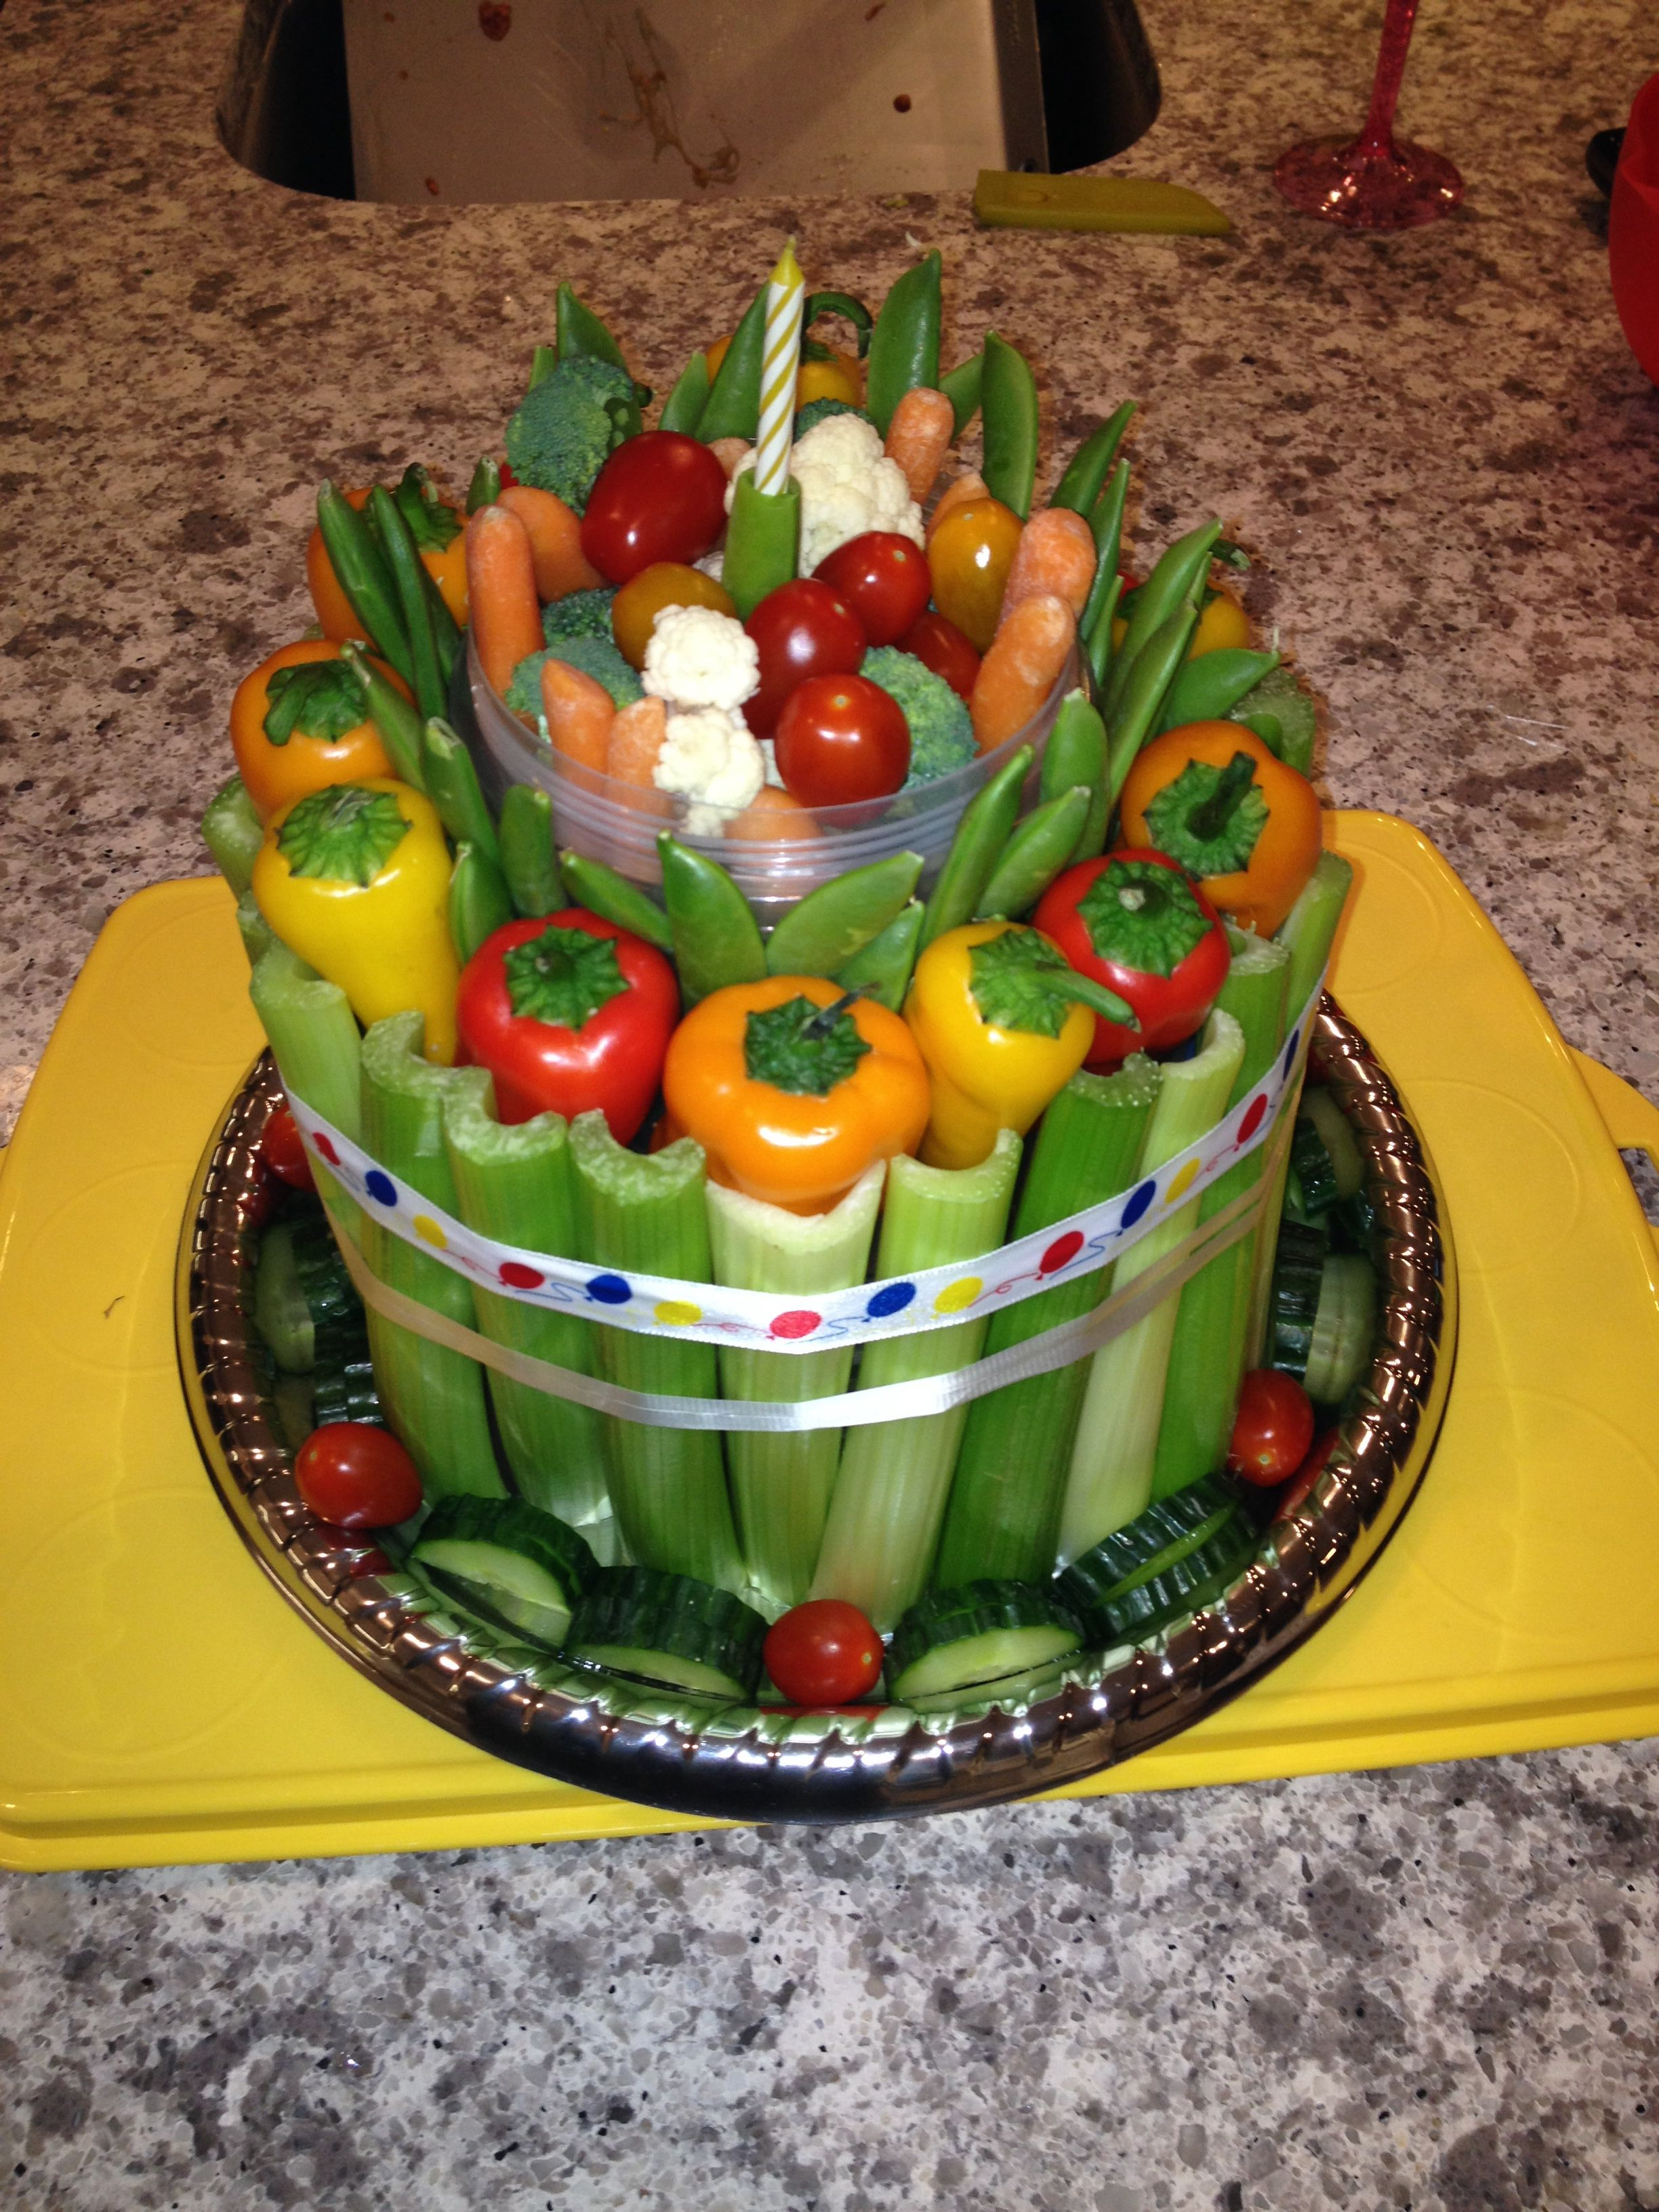 Stupendous Veggie Cake Veggie Cakes Vegetable Cake Healthy Birthday Cakes Funny Birthday Cards Online Alyptdamsfinfo